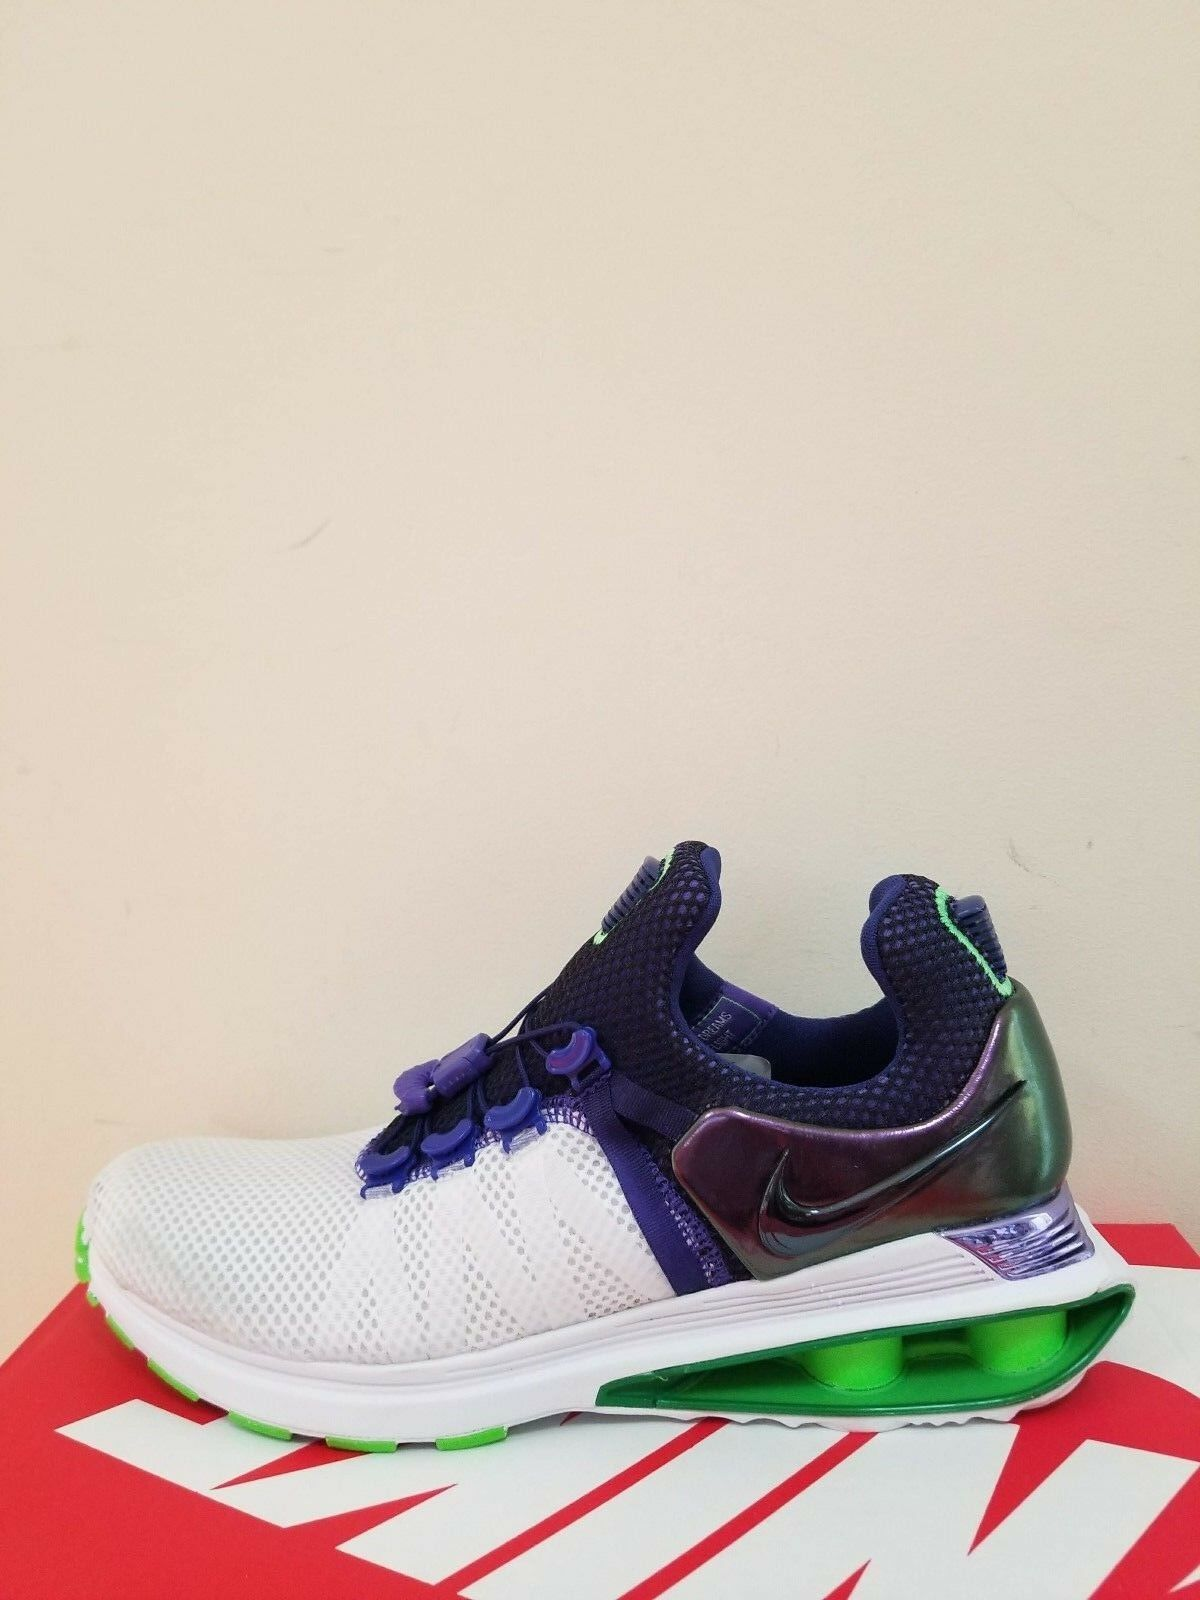 New Nike Women's Shox Gravity Running shoes Size Size Size 8.5 NIB beea64